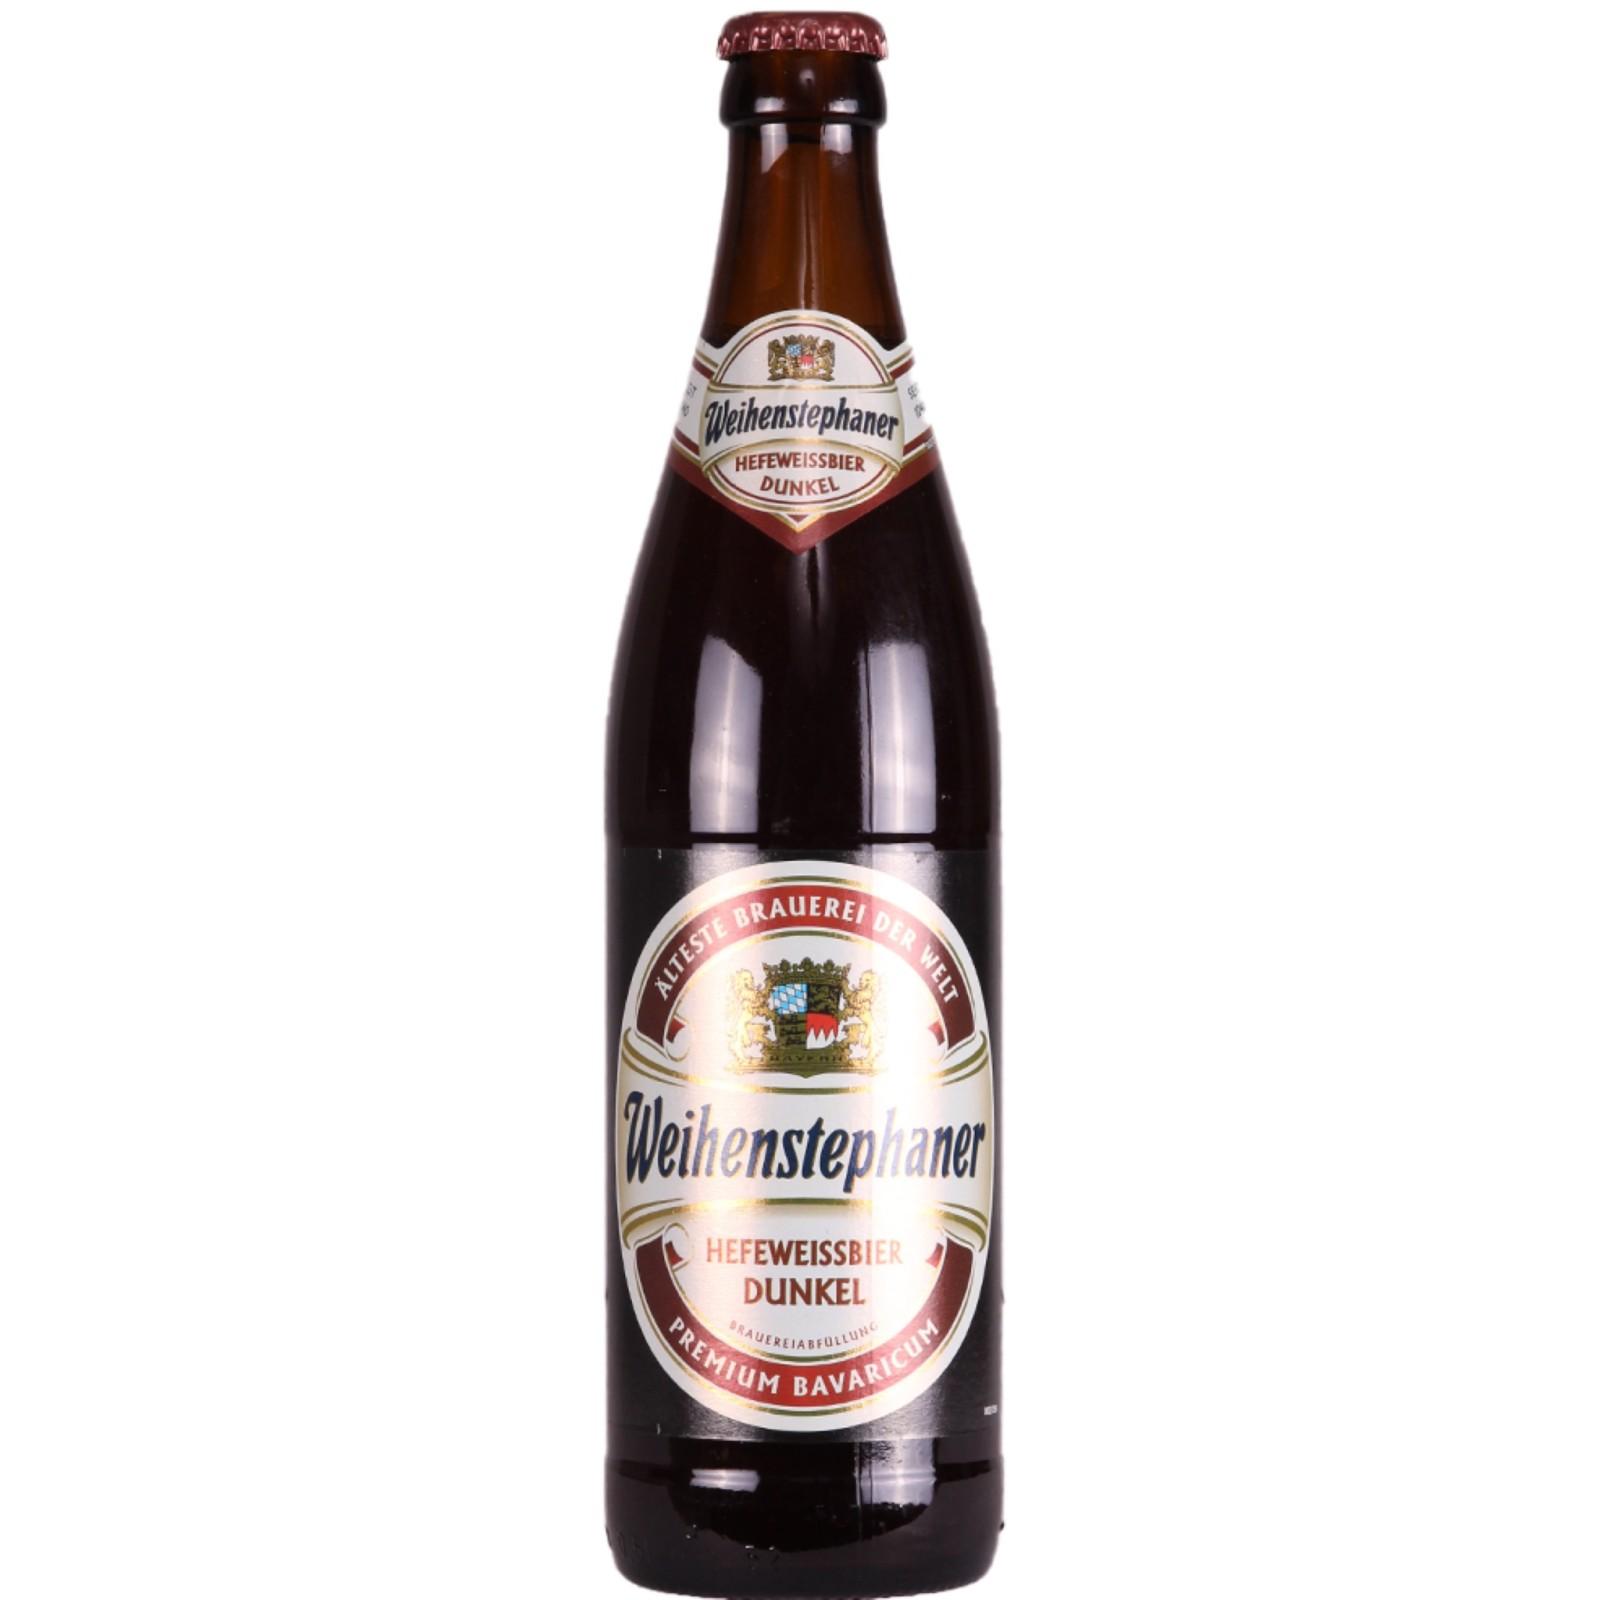 Weihenstephaner Hefeweissbier Dunkel 5.3% 500ml